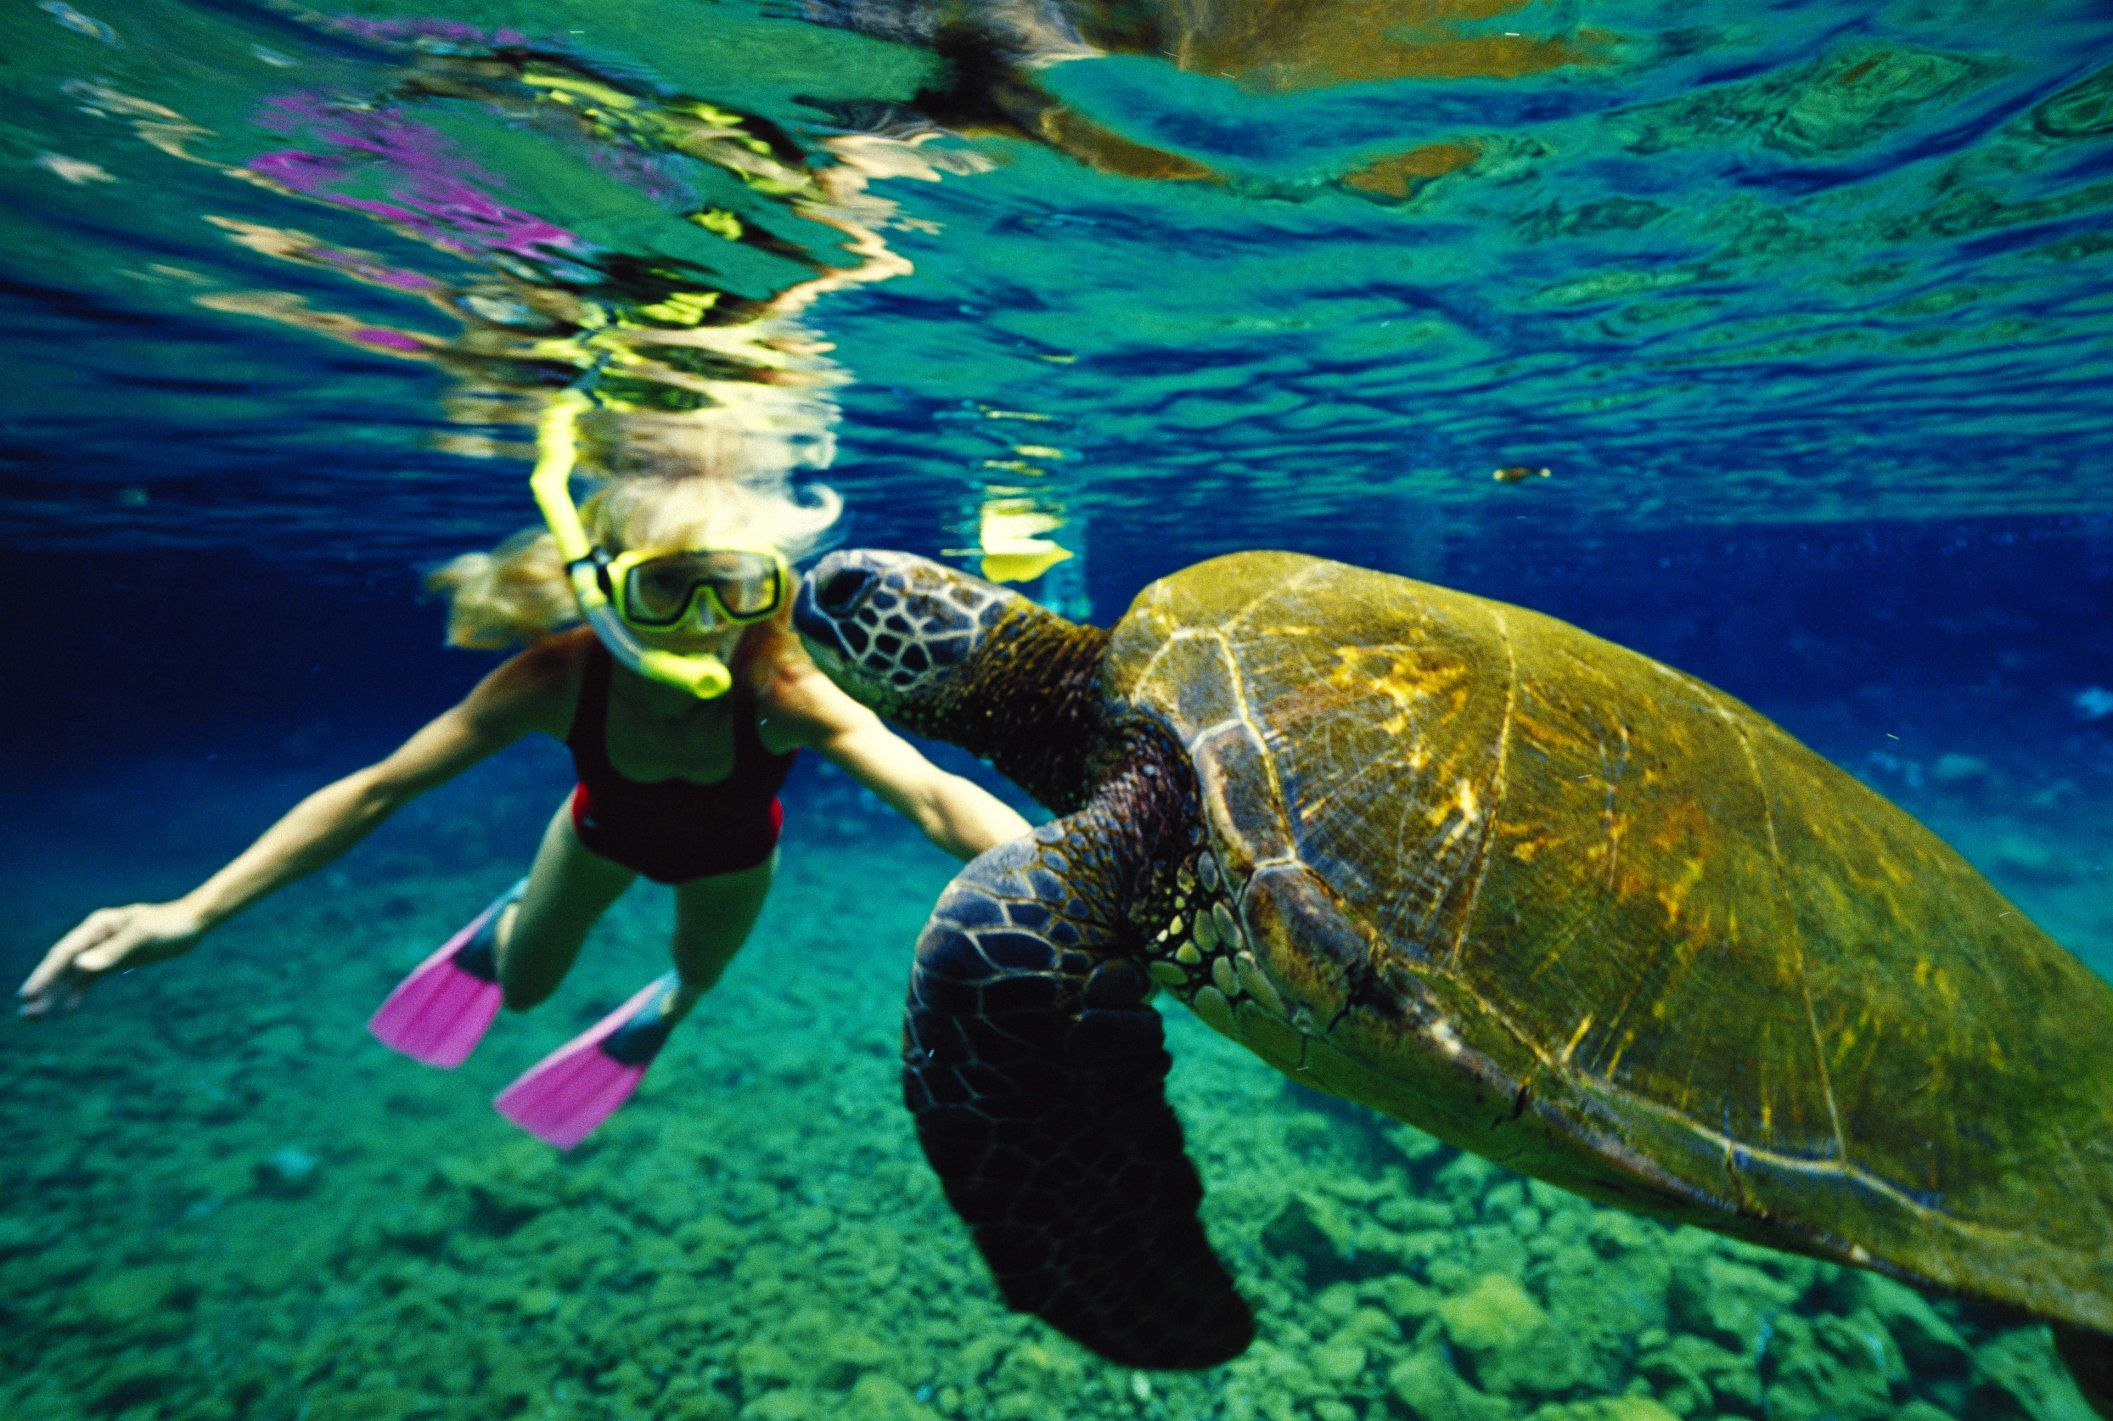 Hawaii closeup of green sea turtle (Chelonia mydas) with girl petting and snorkeling